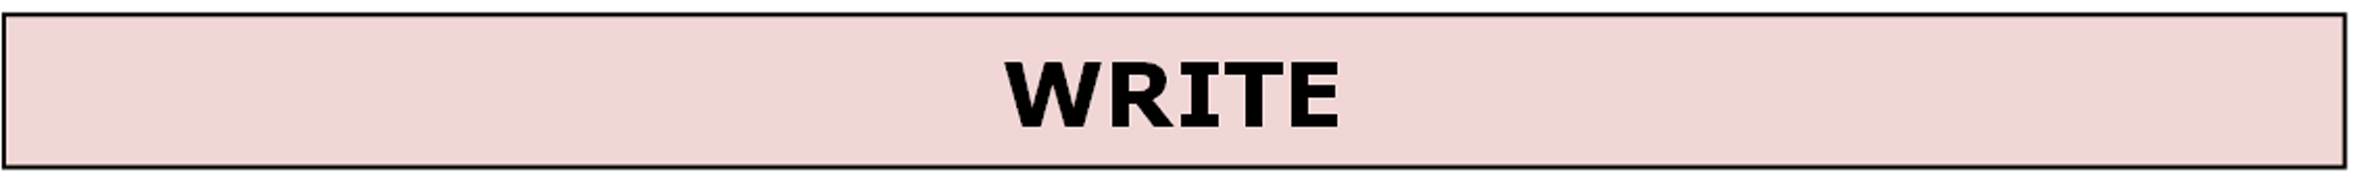 <header04___write.jpg>